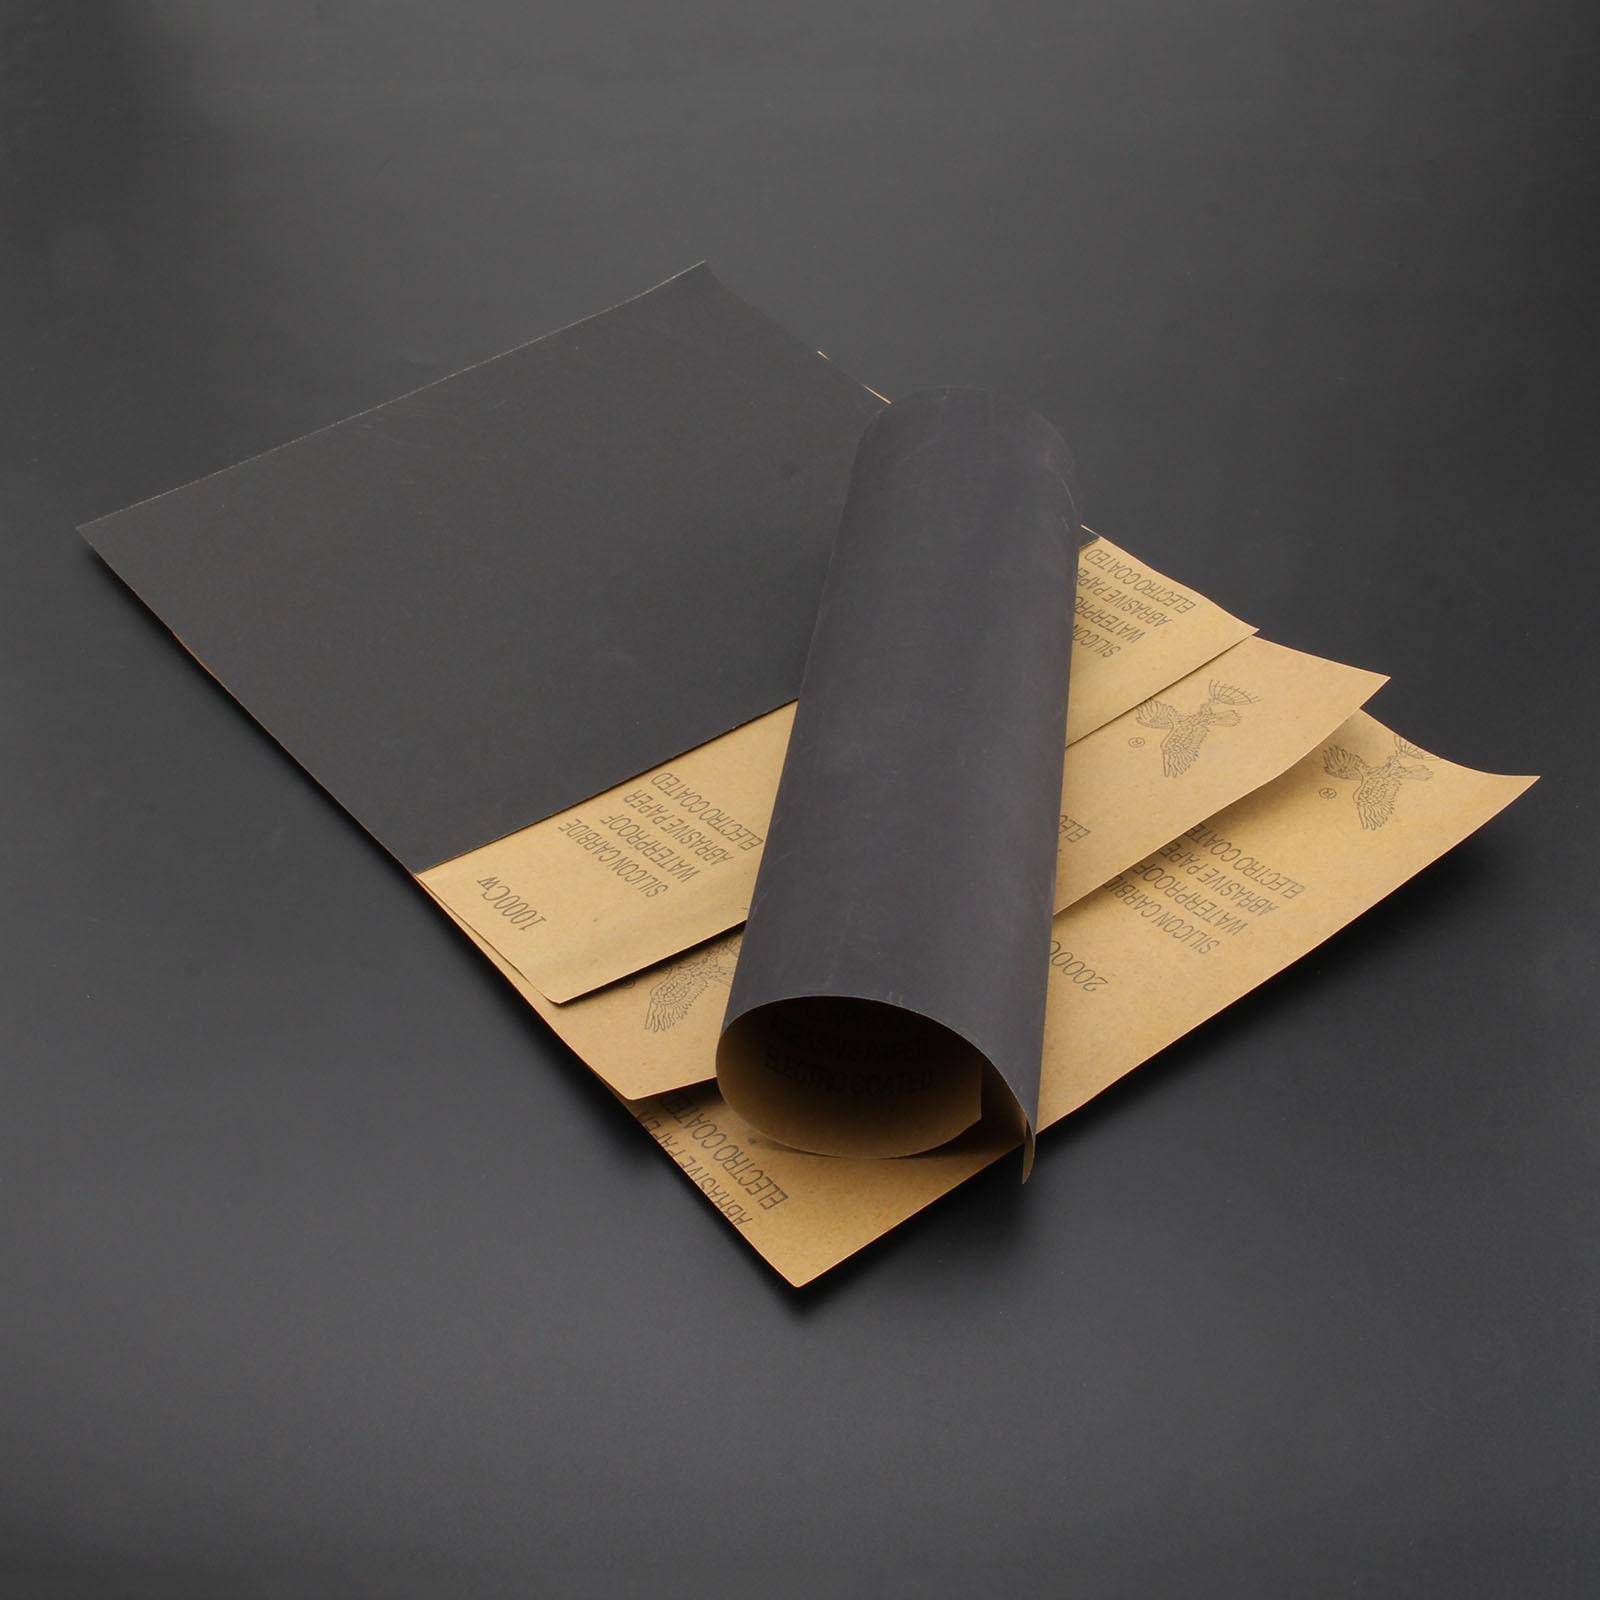 DRELD 5 fogli carta abrasiva impermeabile carta abrasiva carta - Utensili abrasivi - Fotografia 3